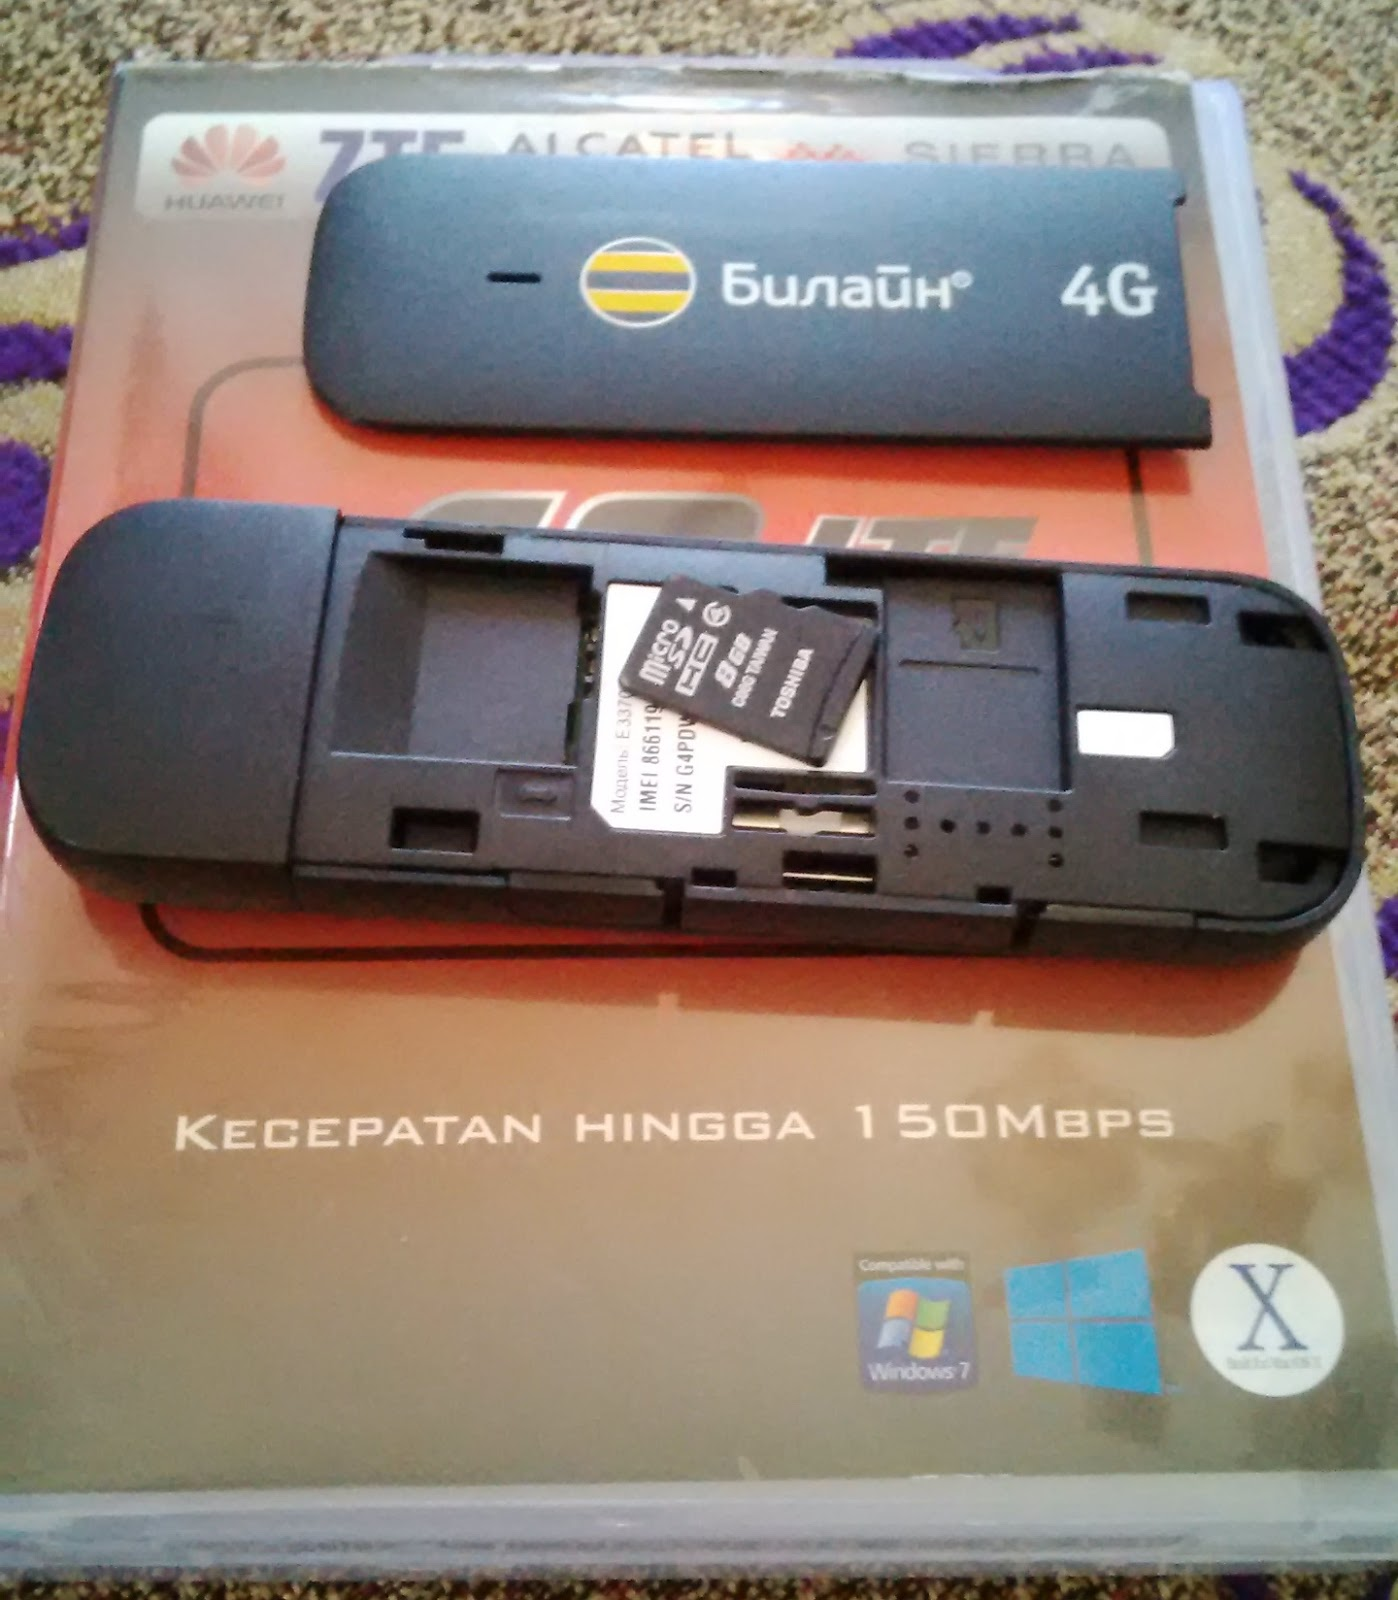 Spesifikasi Modem Huawei E3372 4G LTE 150Mbps All GSM